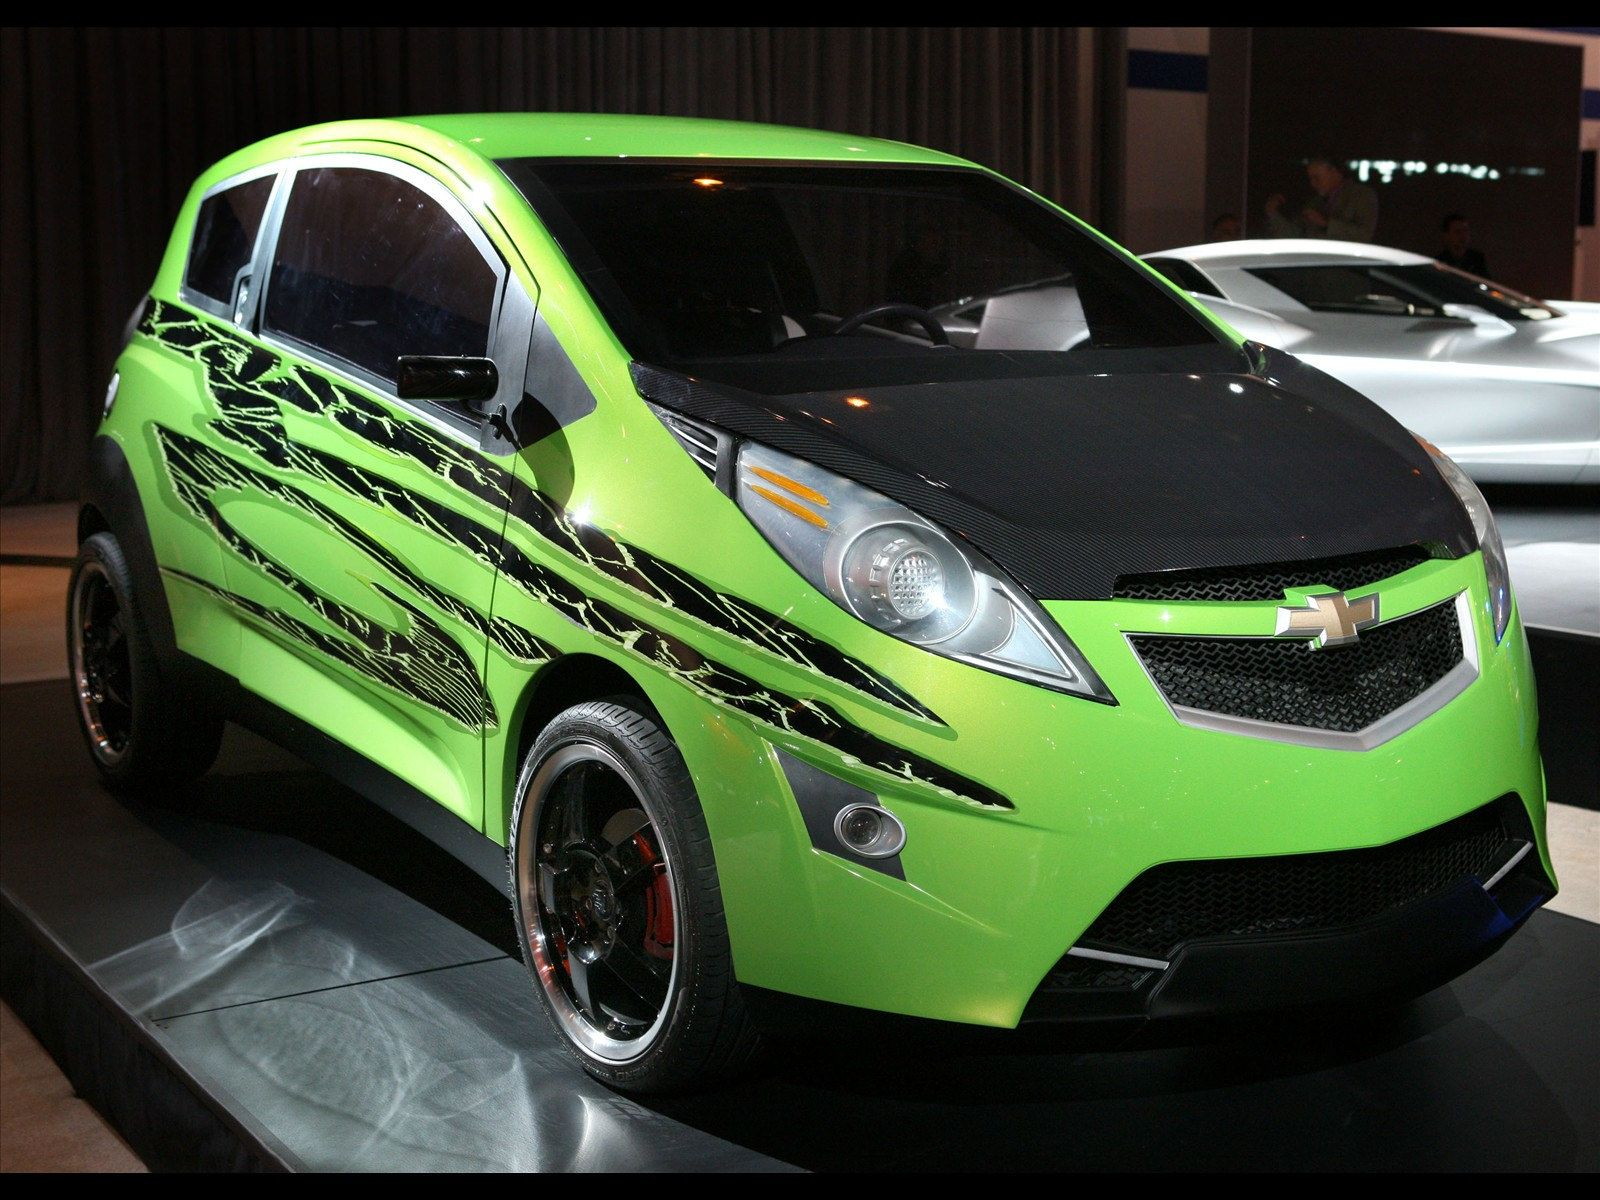 Skids 2009 01 Chevrolet Spark Chevrolet Twin Car